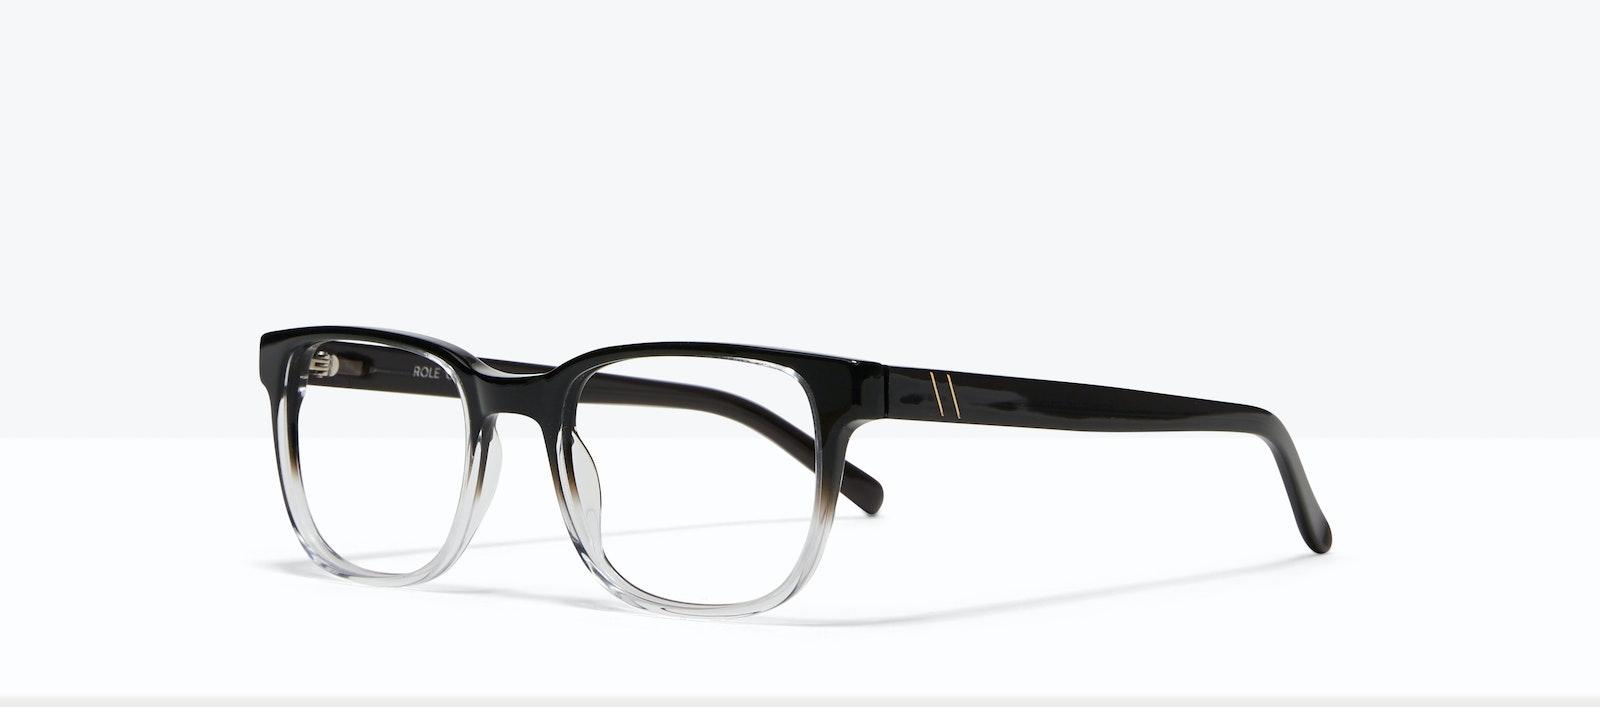 Affordable Fashion Glasses Square Eyeglasses Men Role Onyx Clear Tilt